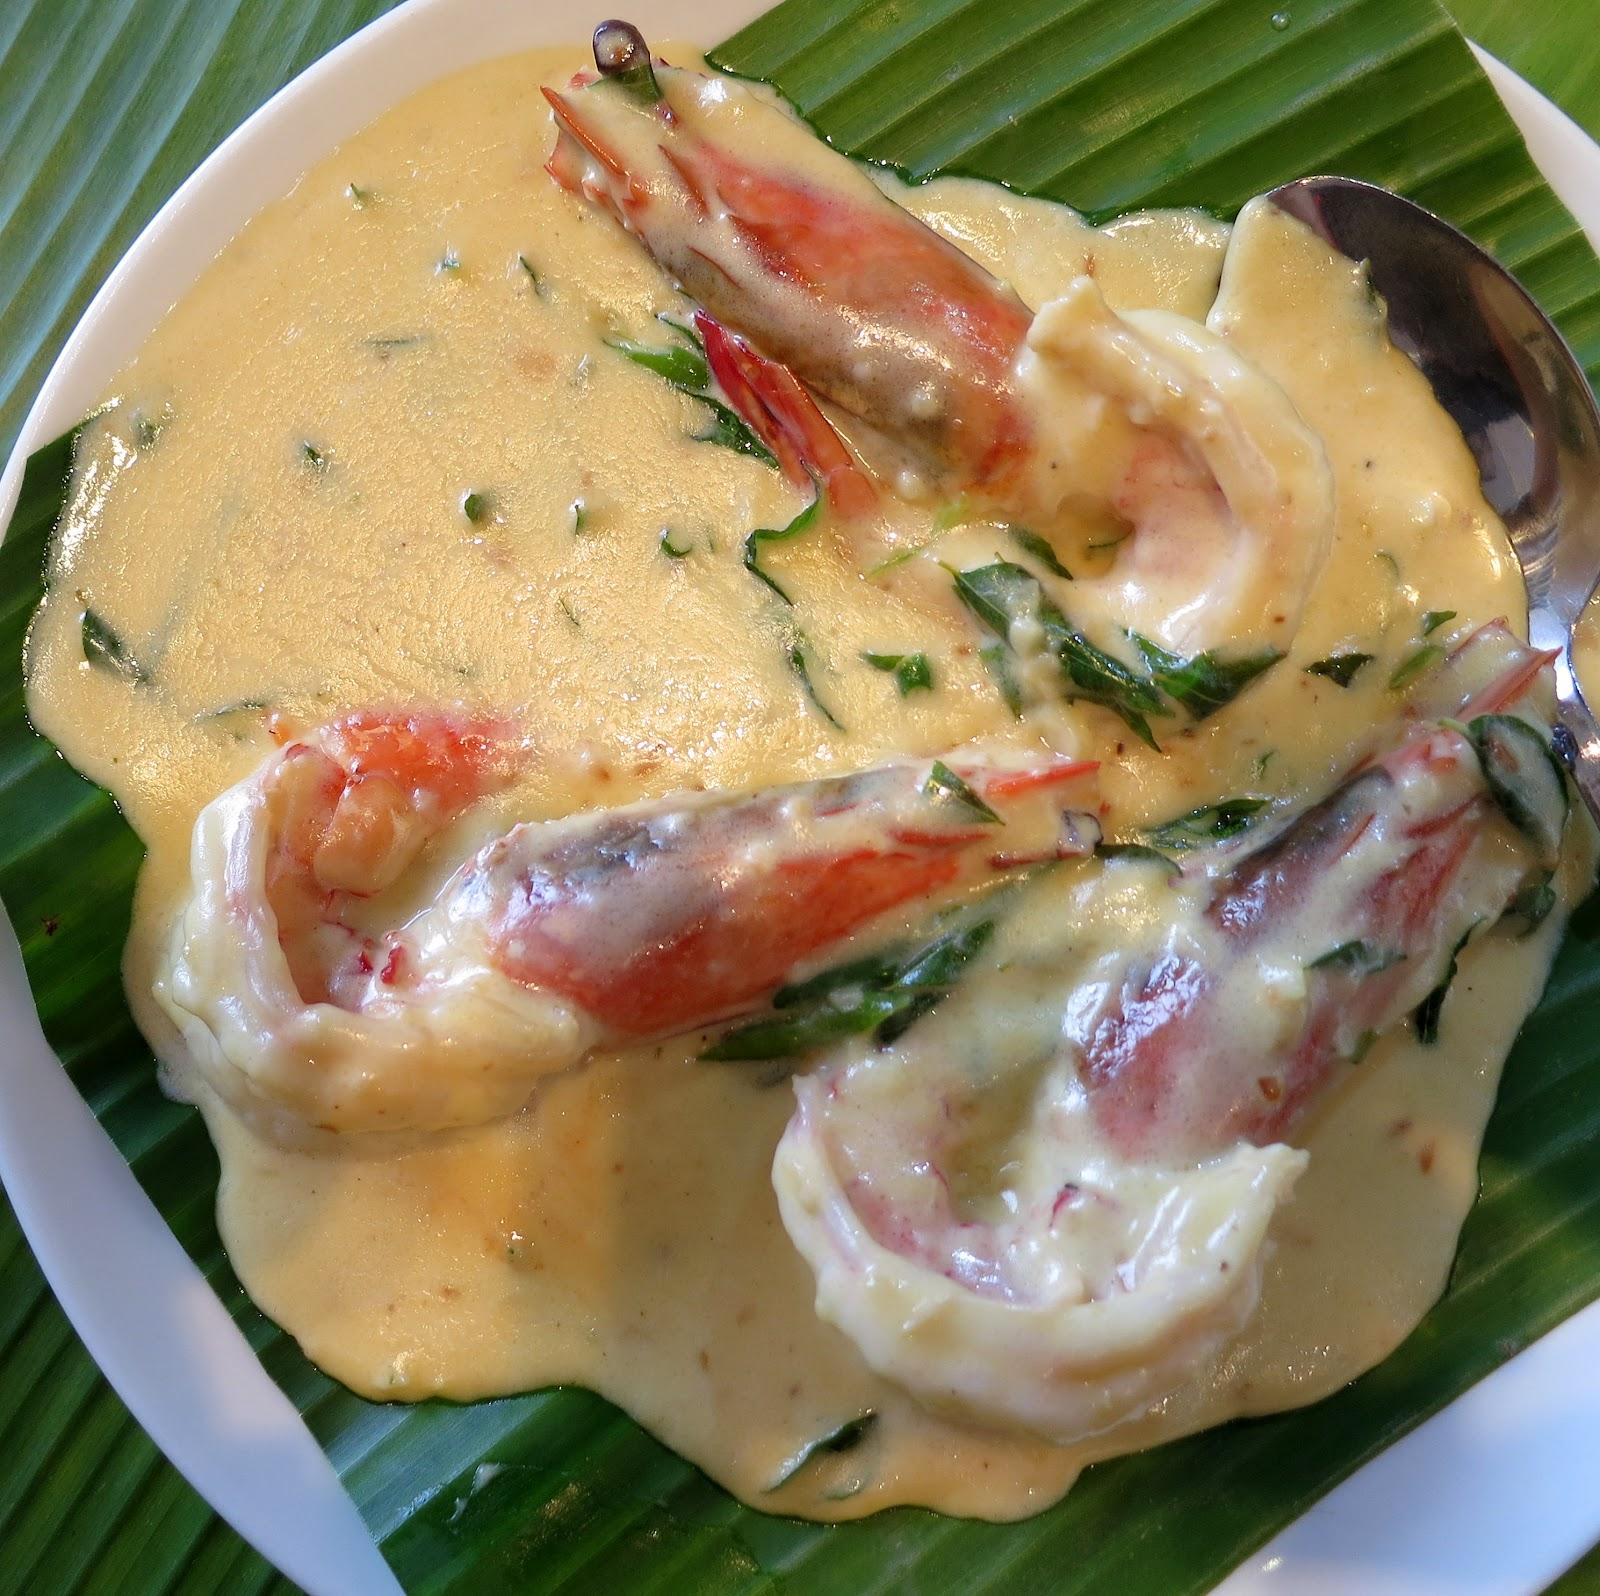 7 spice indian cuisine at danga bay johor bahru malaysia for Cuisine kaki